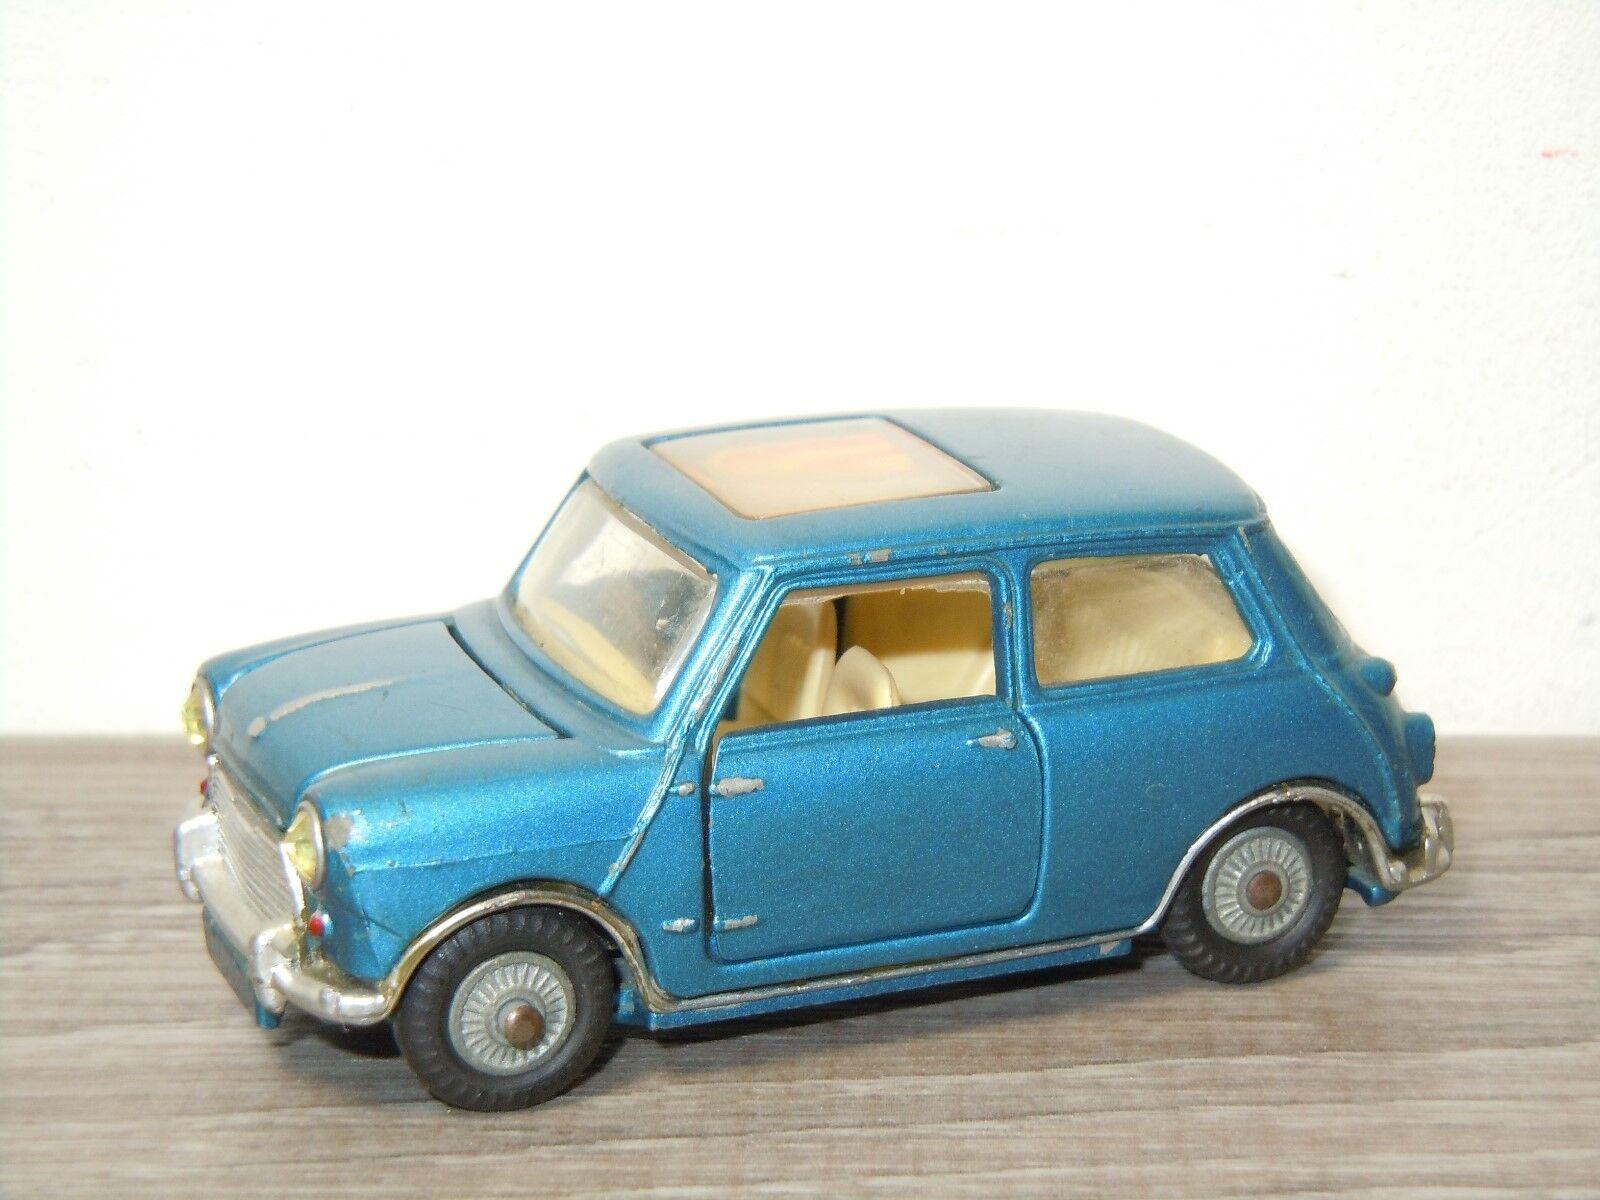 BMC Mini Cooper S - Corgi Toys 334 England 30497